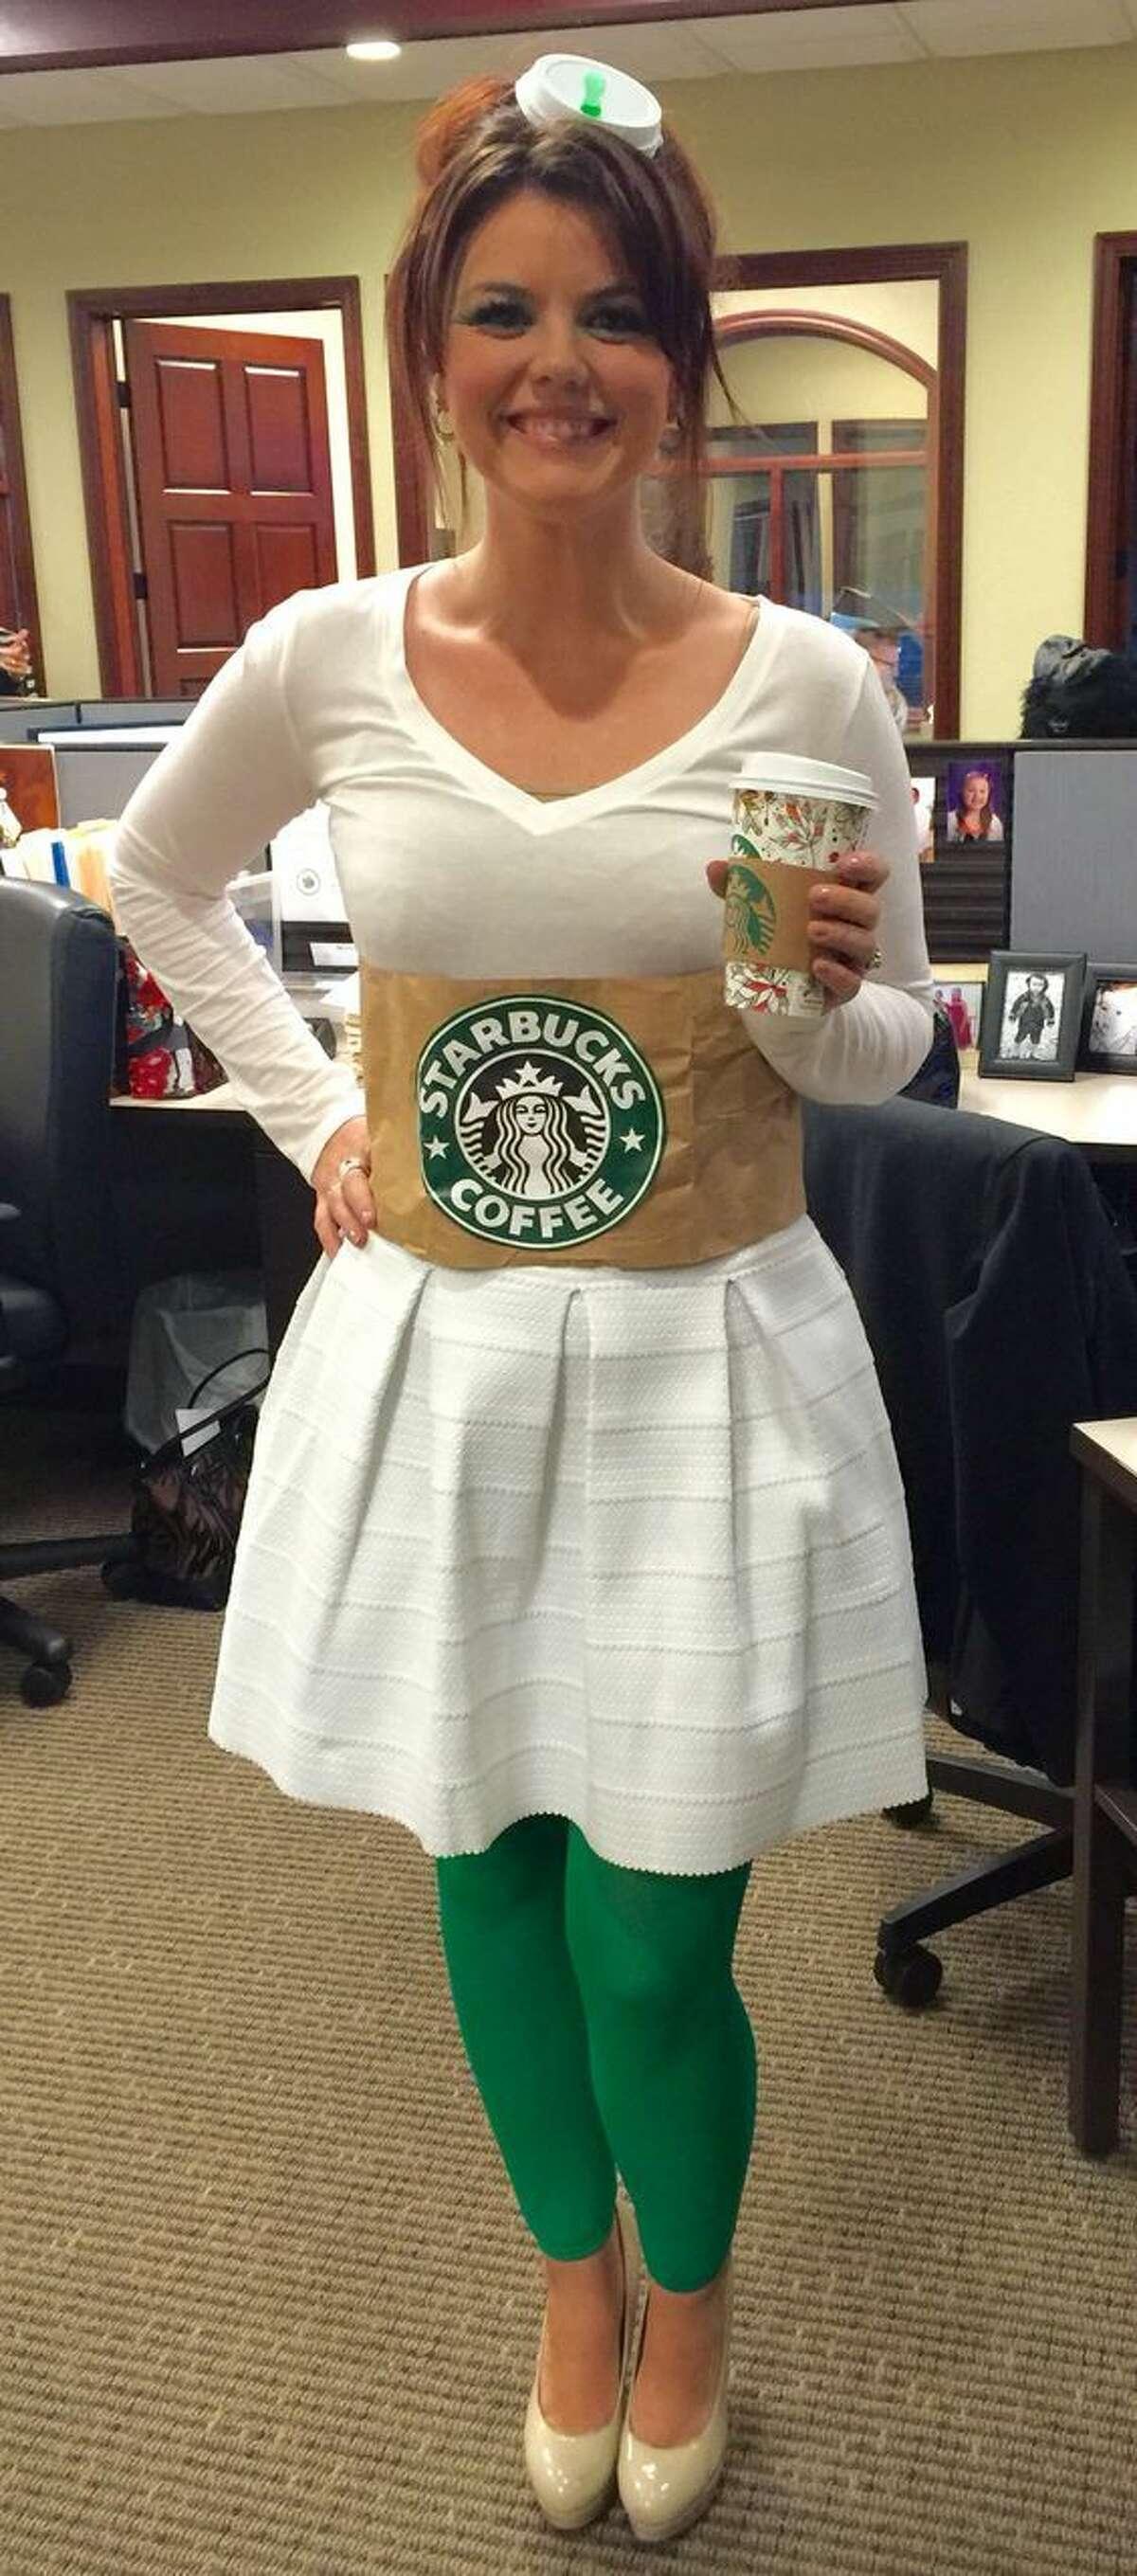 Starbucks CoffeeWhat you'll need:- White dress/ Shirt- Green leggings/ Pants- Large Starbucks bag Photo: Pinterest